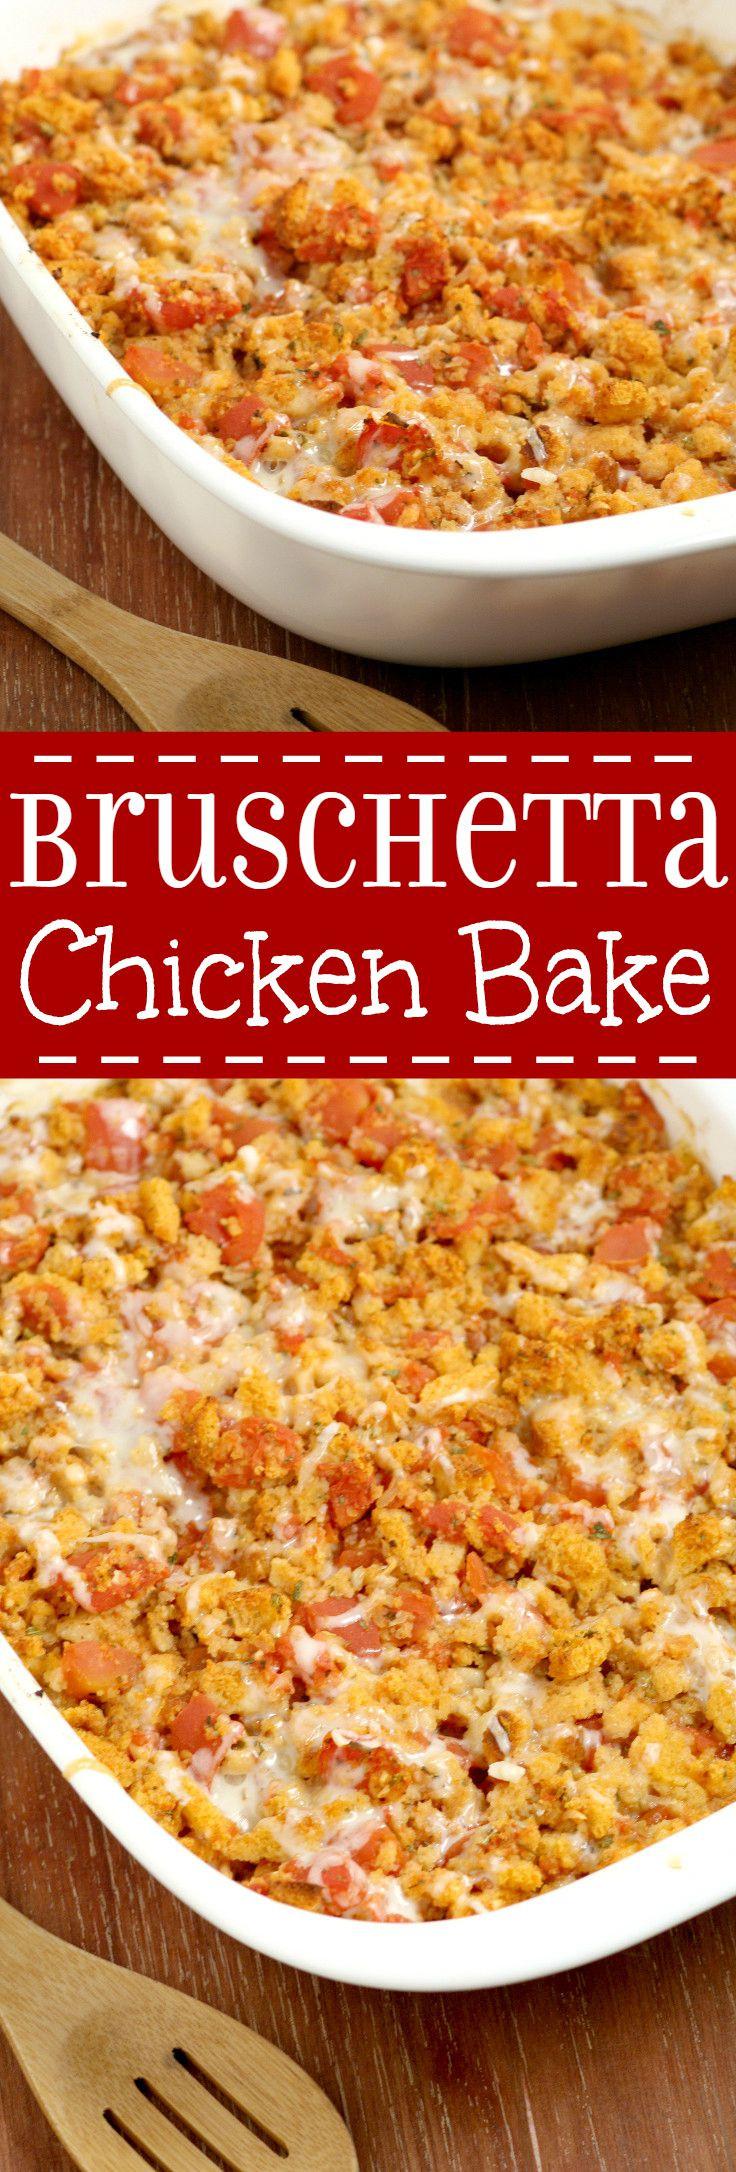 Bruschetta Chicken Bake  Bruschetta Chicken Bake